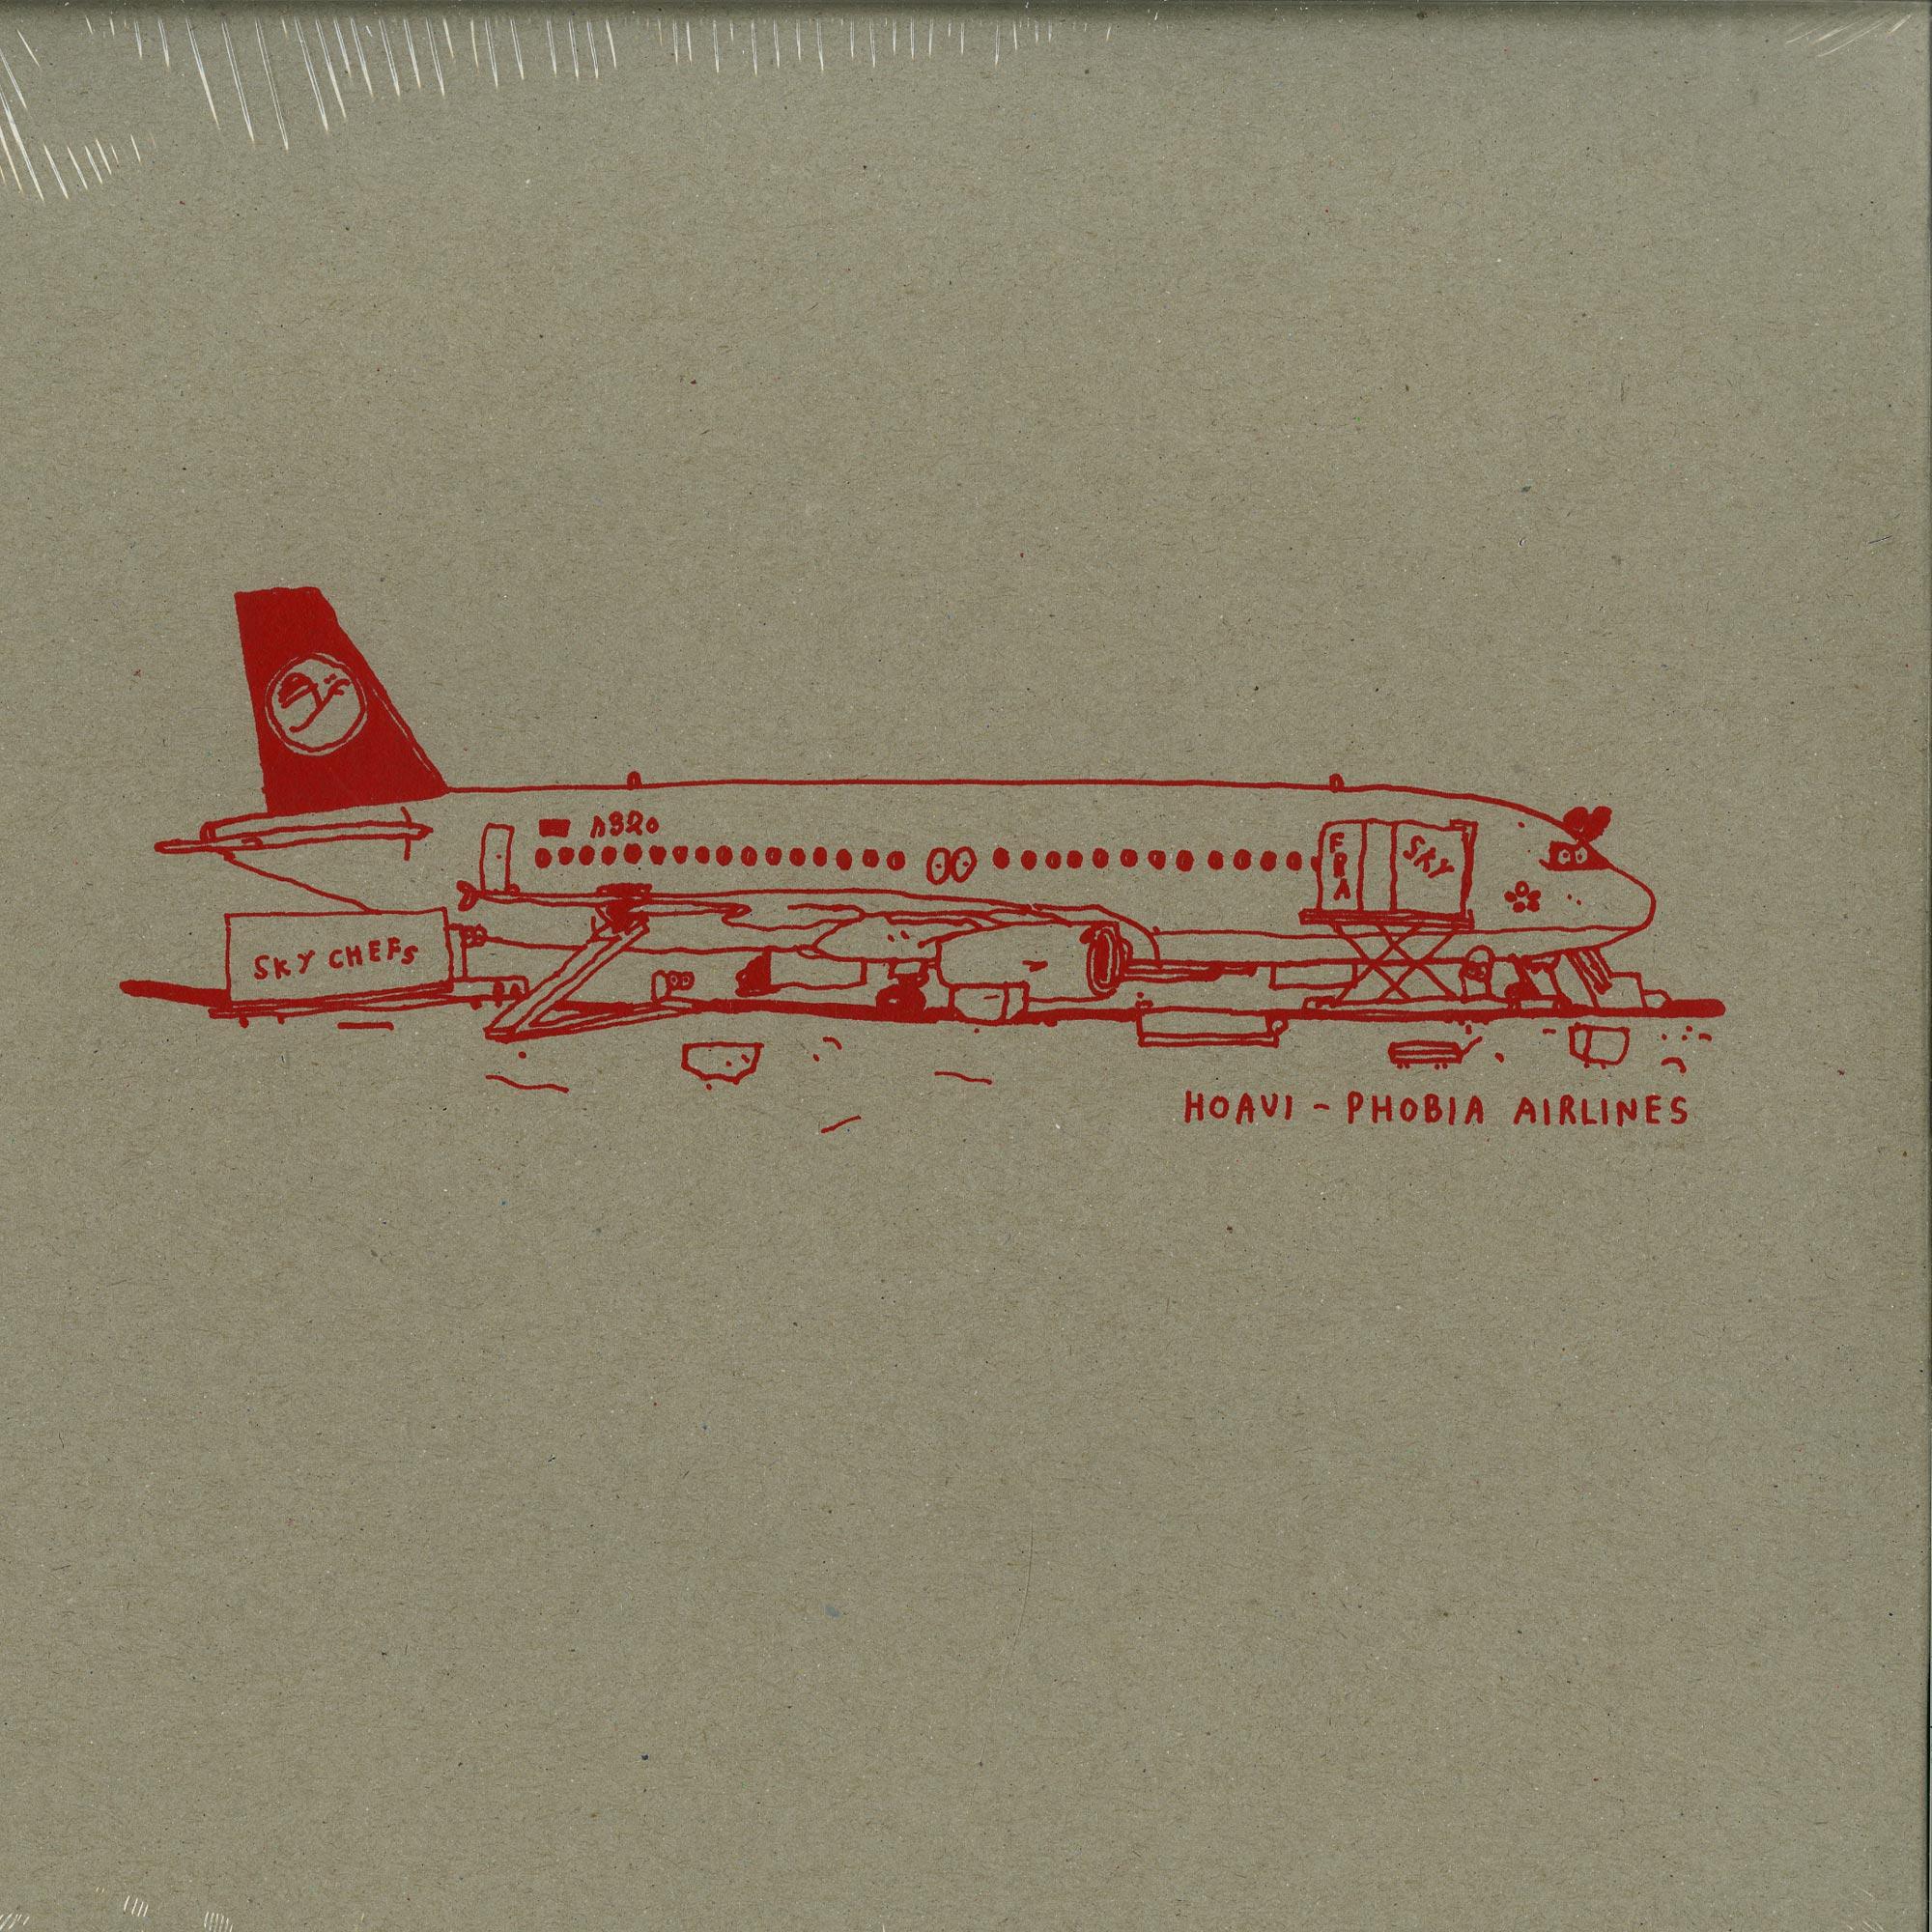 Hoavi - PHOBIA AIRLINES